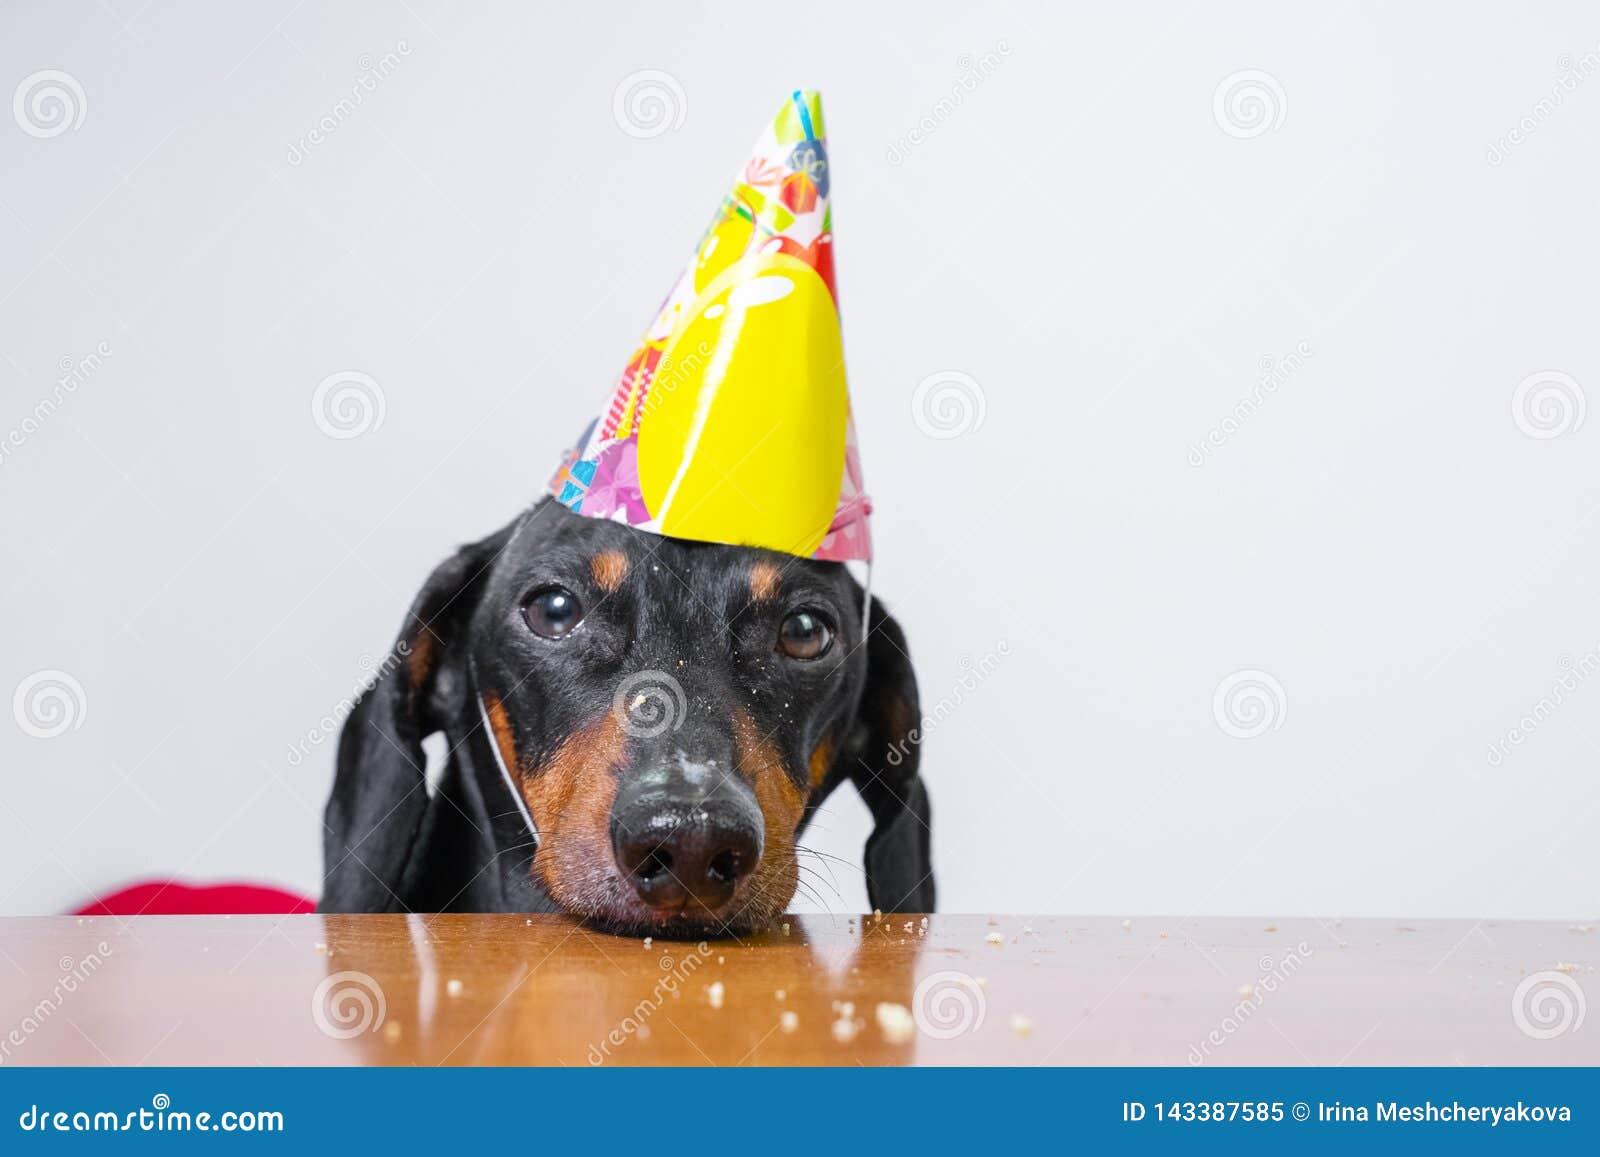 Groovy Cute Dog Breed Dachshund Black And Tan Eat Birthday Cake Wearing Funny Birthday Cards Online Unhofree Goldxyz